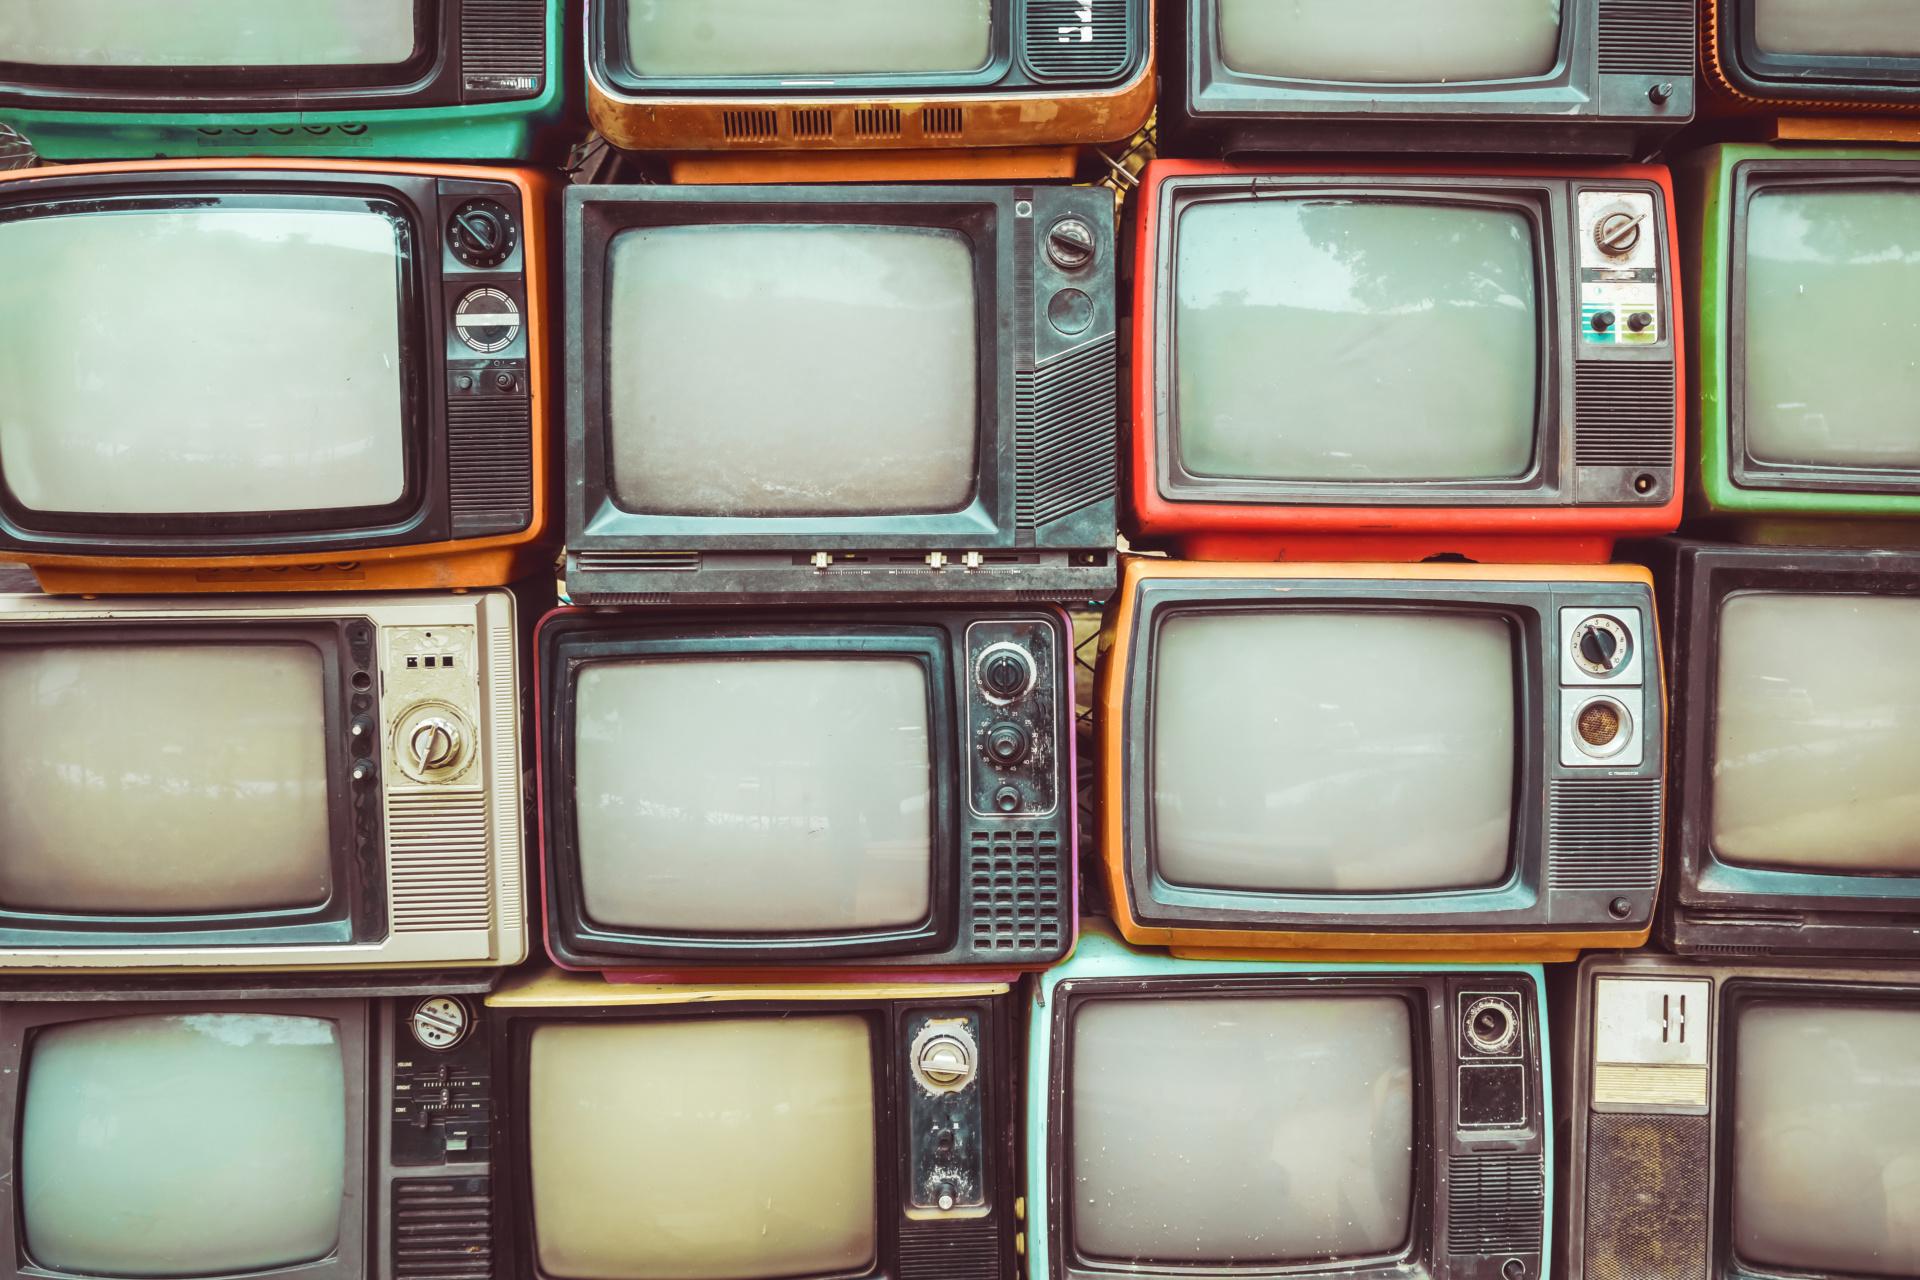 What's Killing TV?